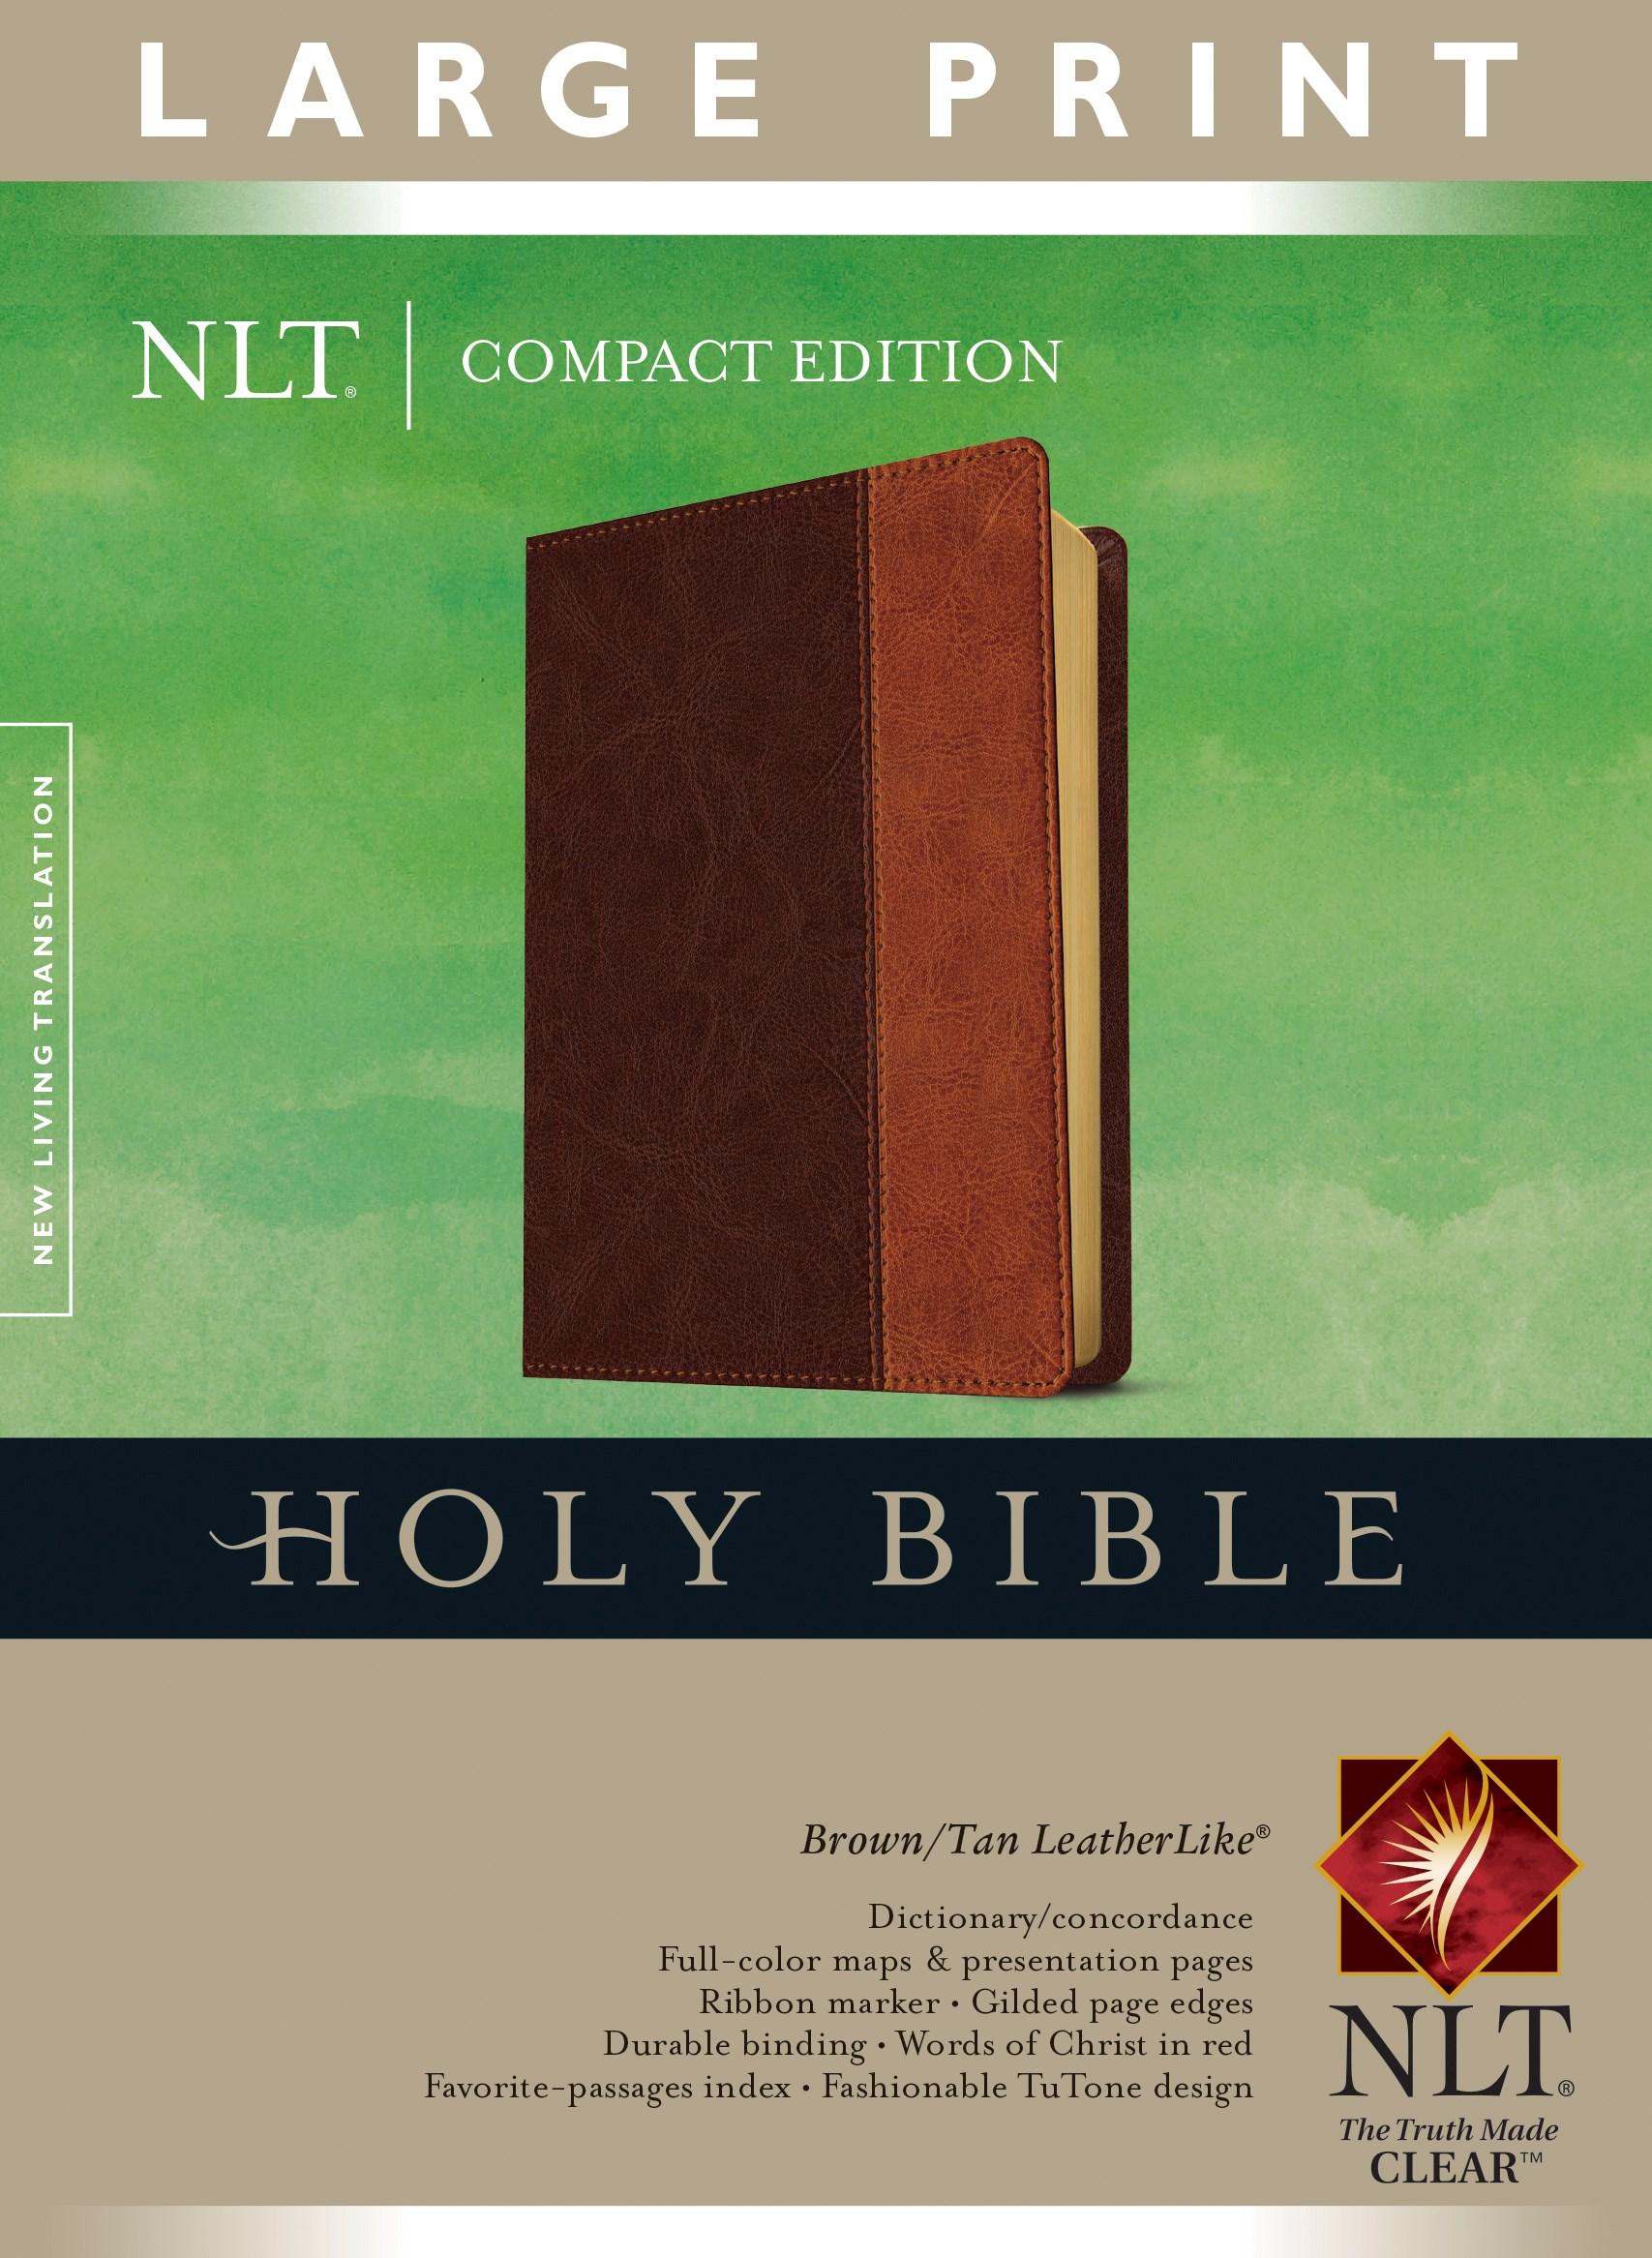 NLT Compact Edition Bible/Large Print-Brown/Tan TuTone